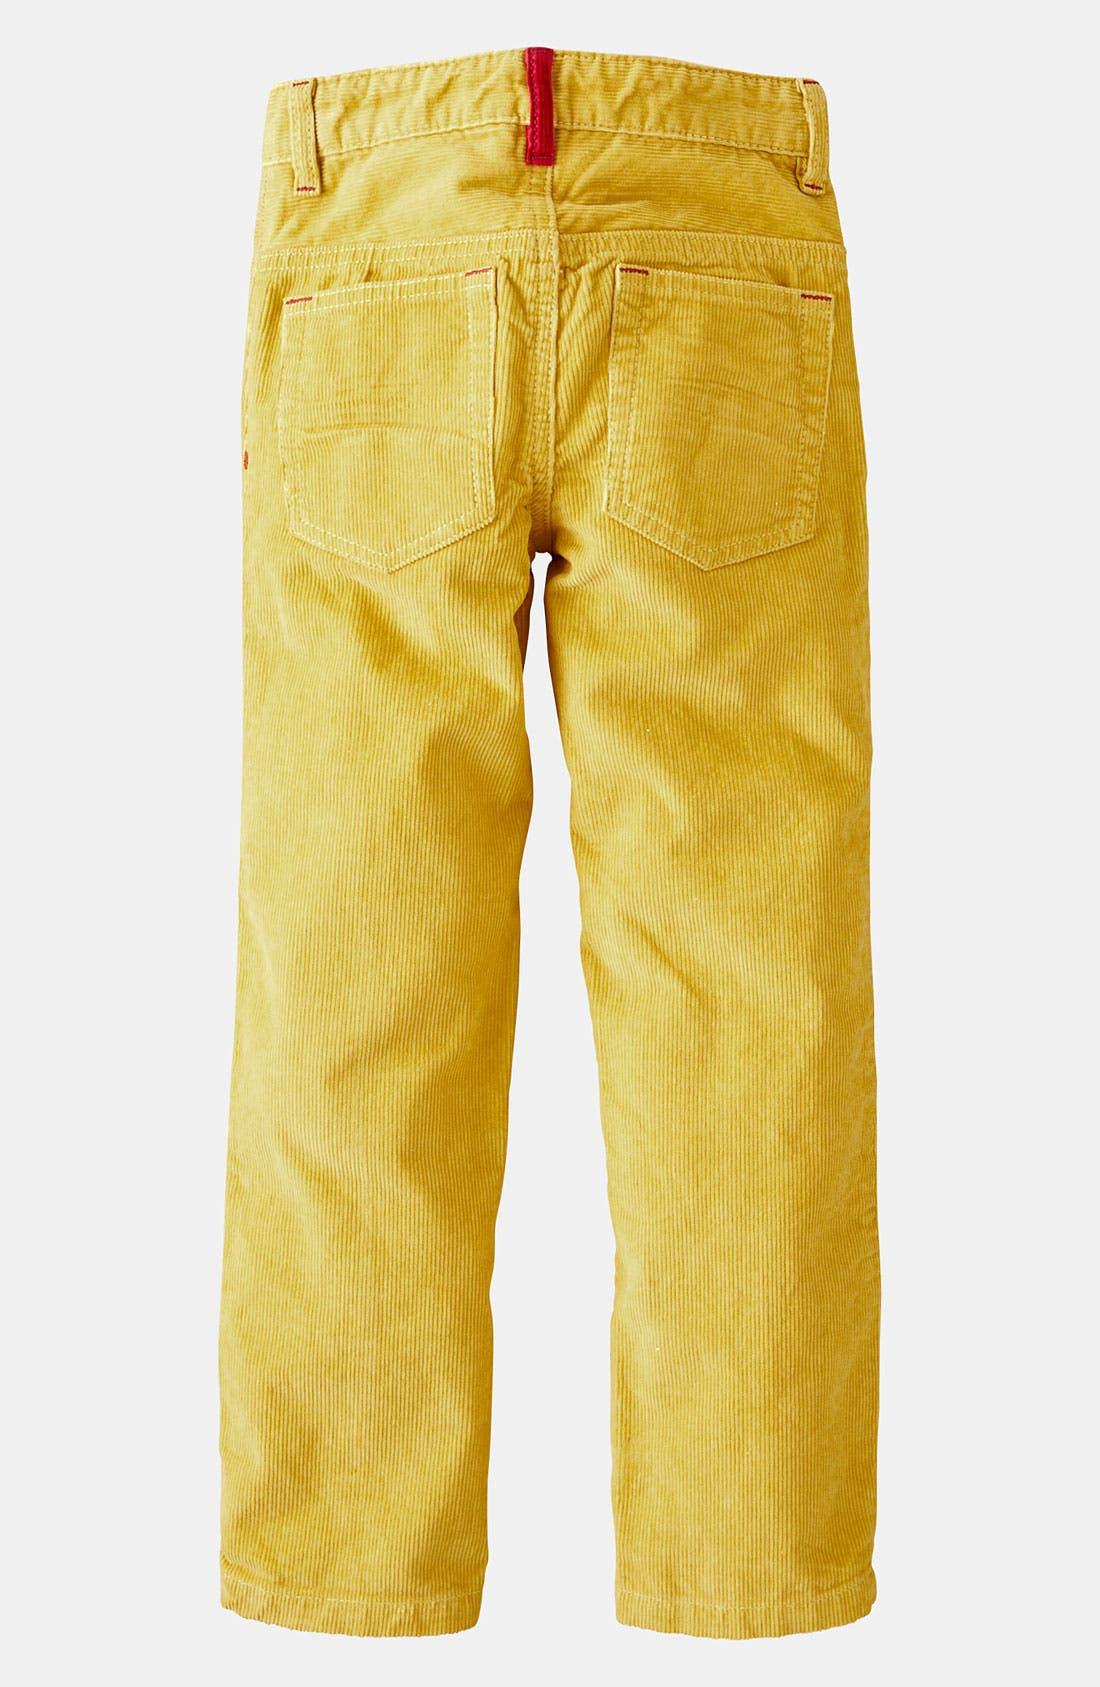 'Preppy' Slim Corduroy Pants,                             Alternate thumbnail 4, color,